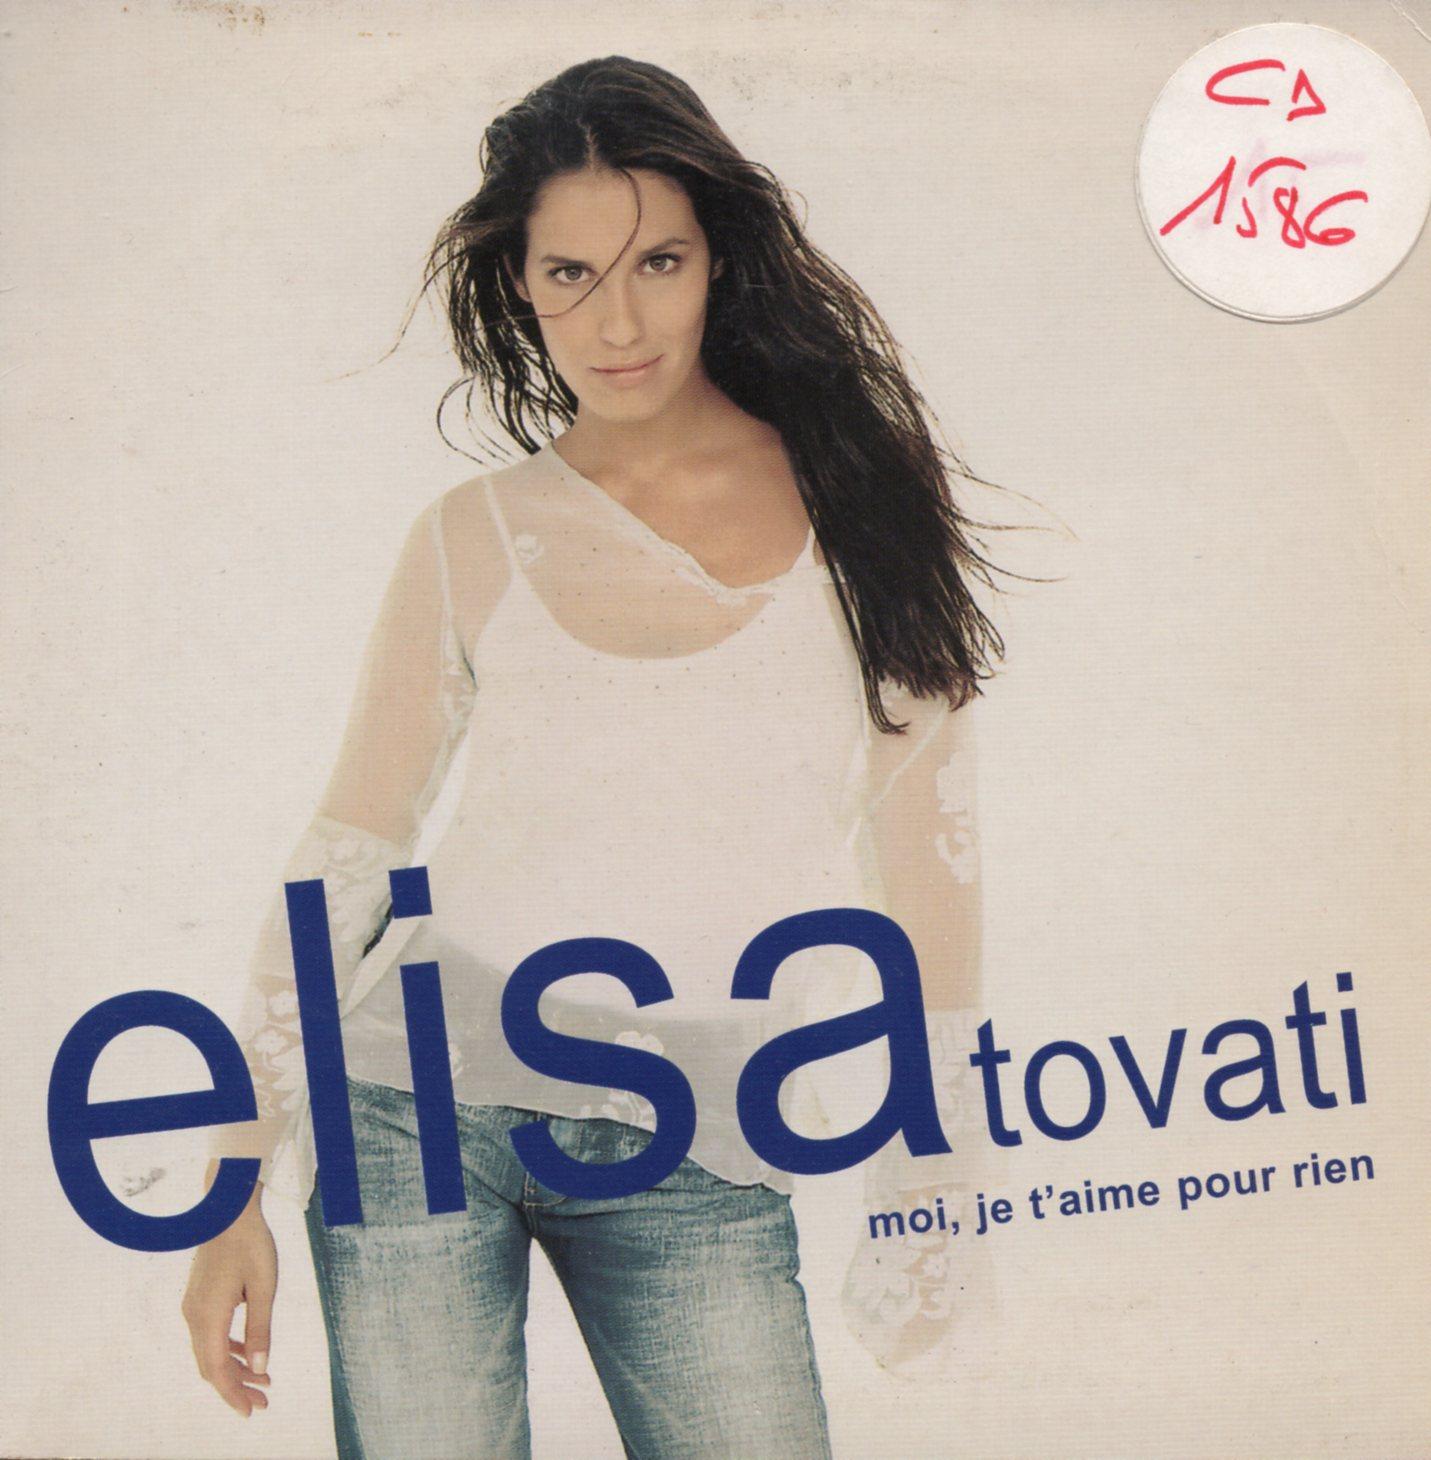 ELISA TOVATI - Moi, je t'aime pour rien Promo 1-track card sleeve - CD single